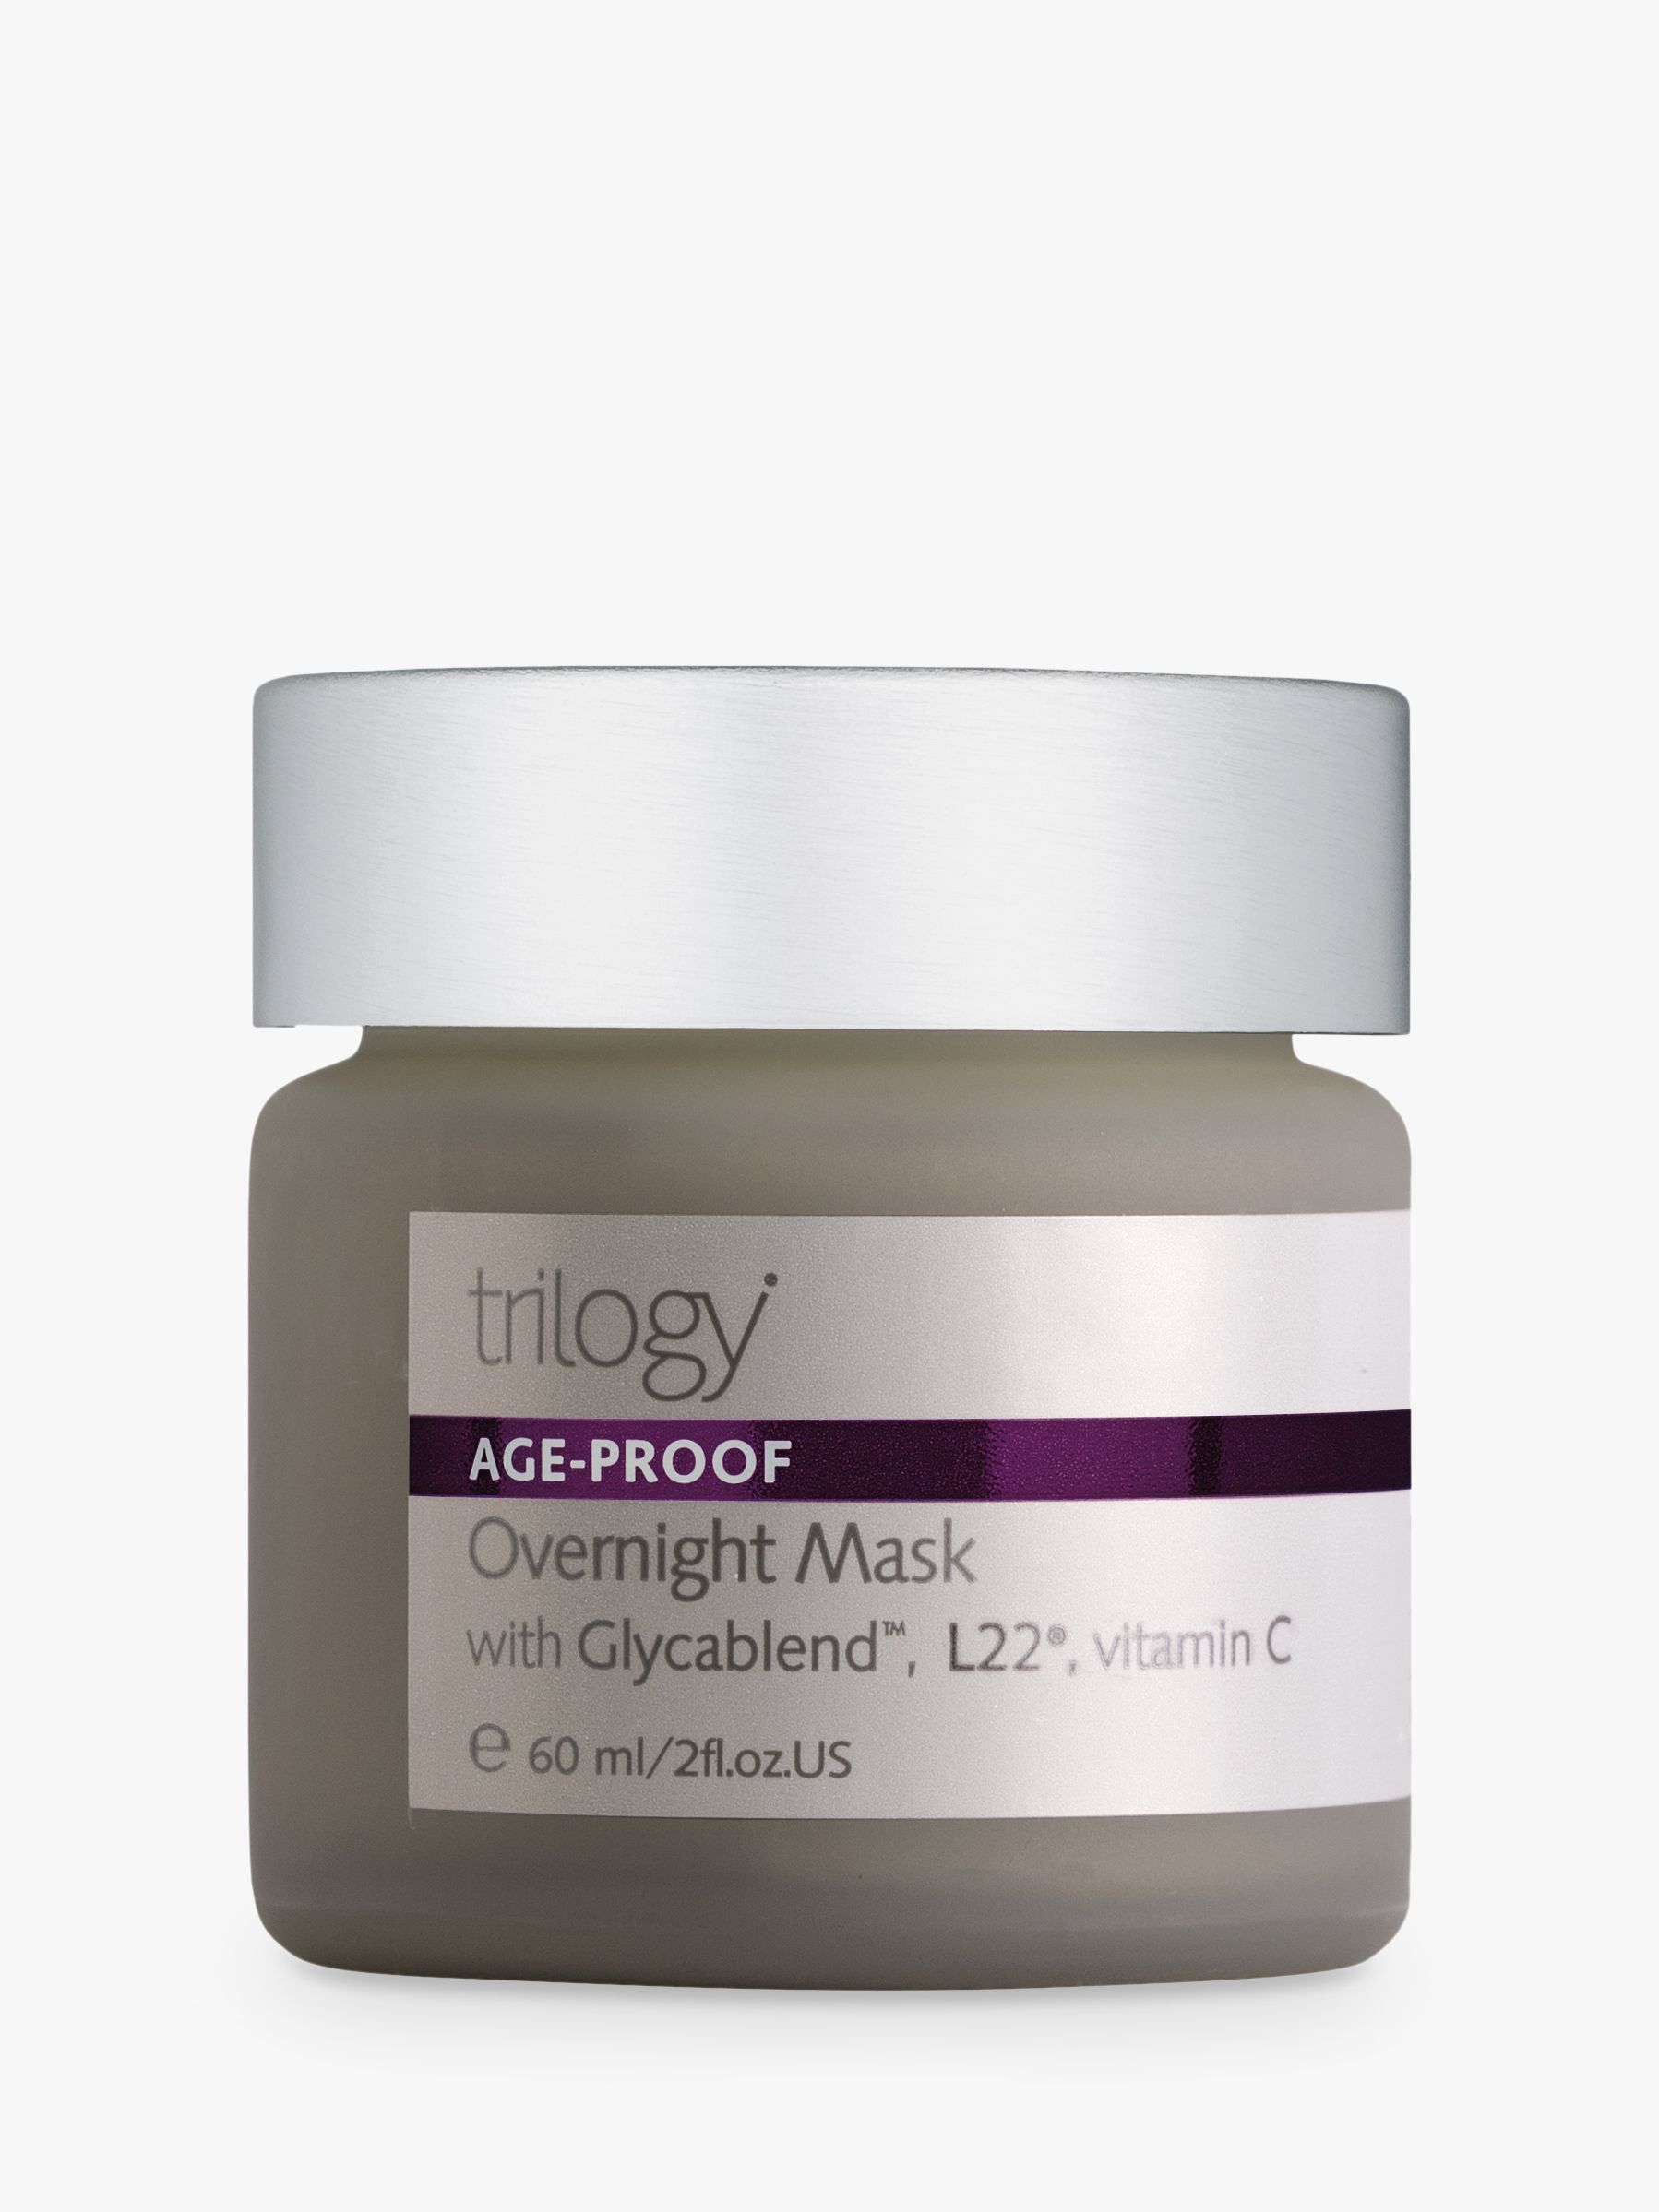 Trilogy Trilogy Age-Proof Overnight Mask, 60ml